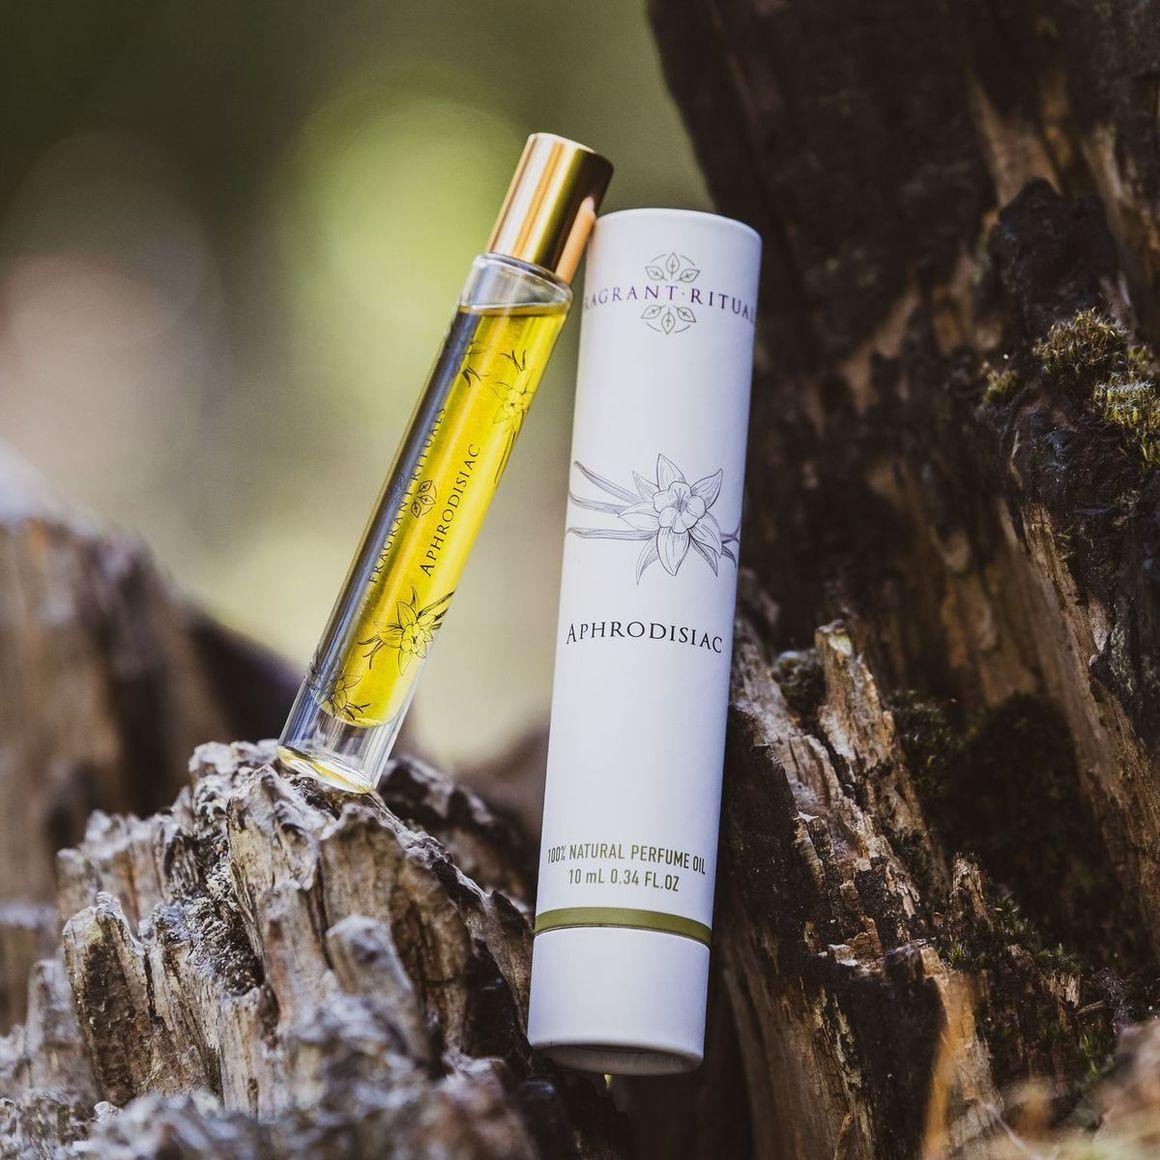 APHRODISIAC 10ml perfume oil | Trada Marketplace